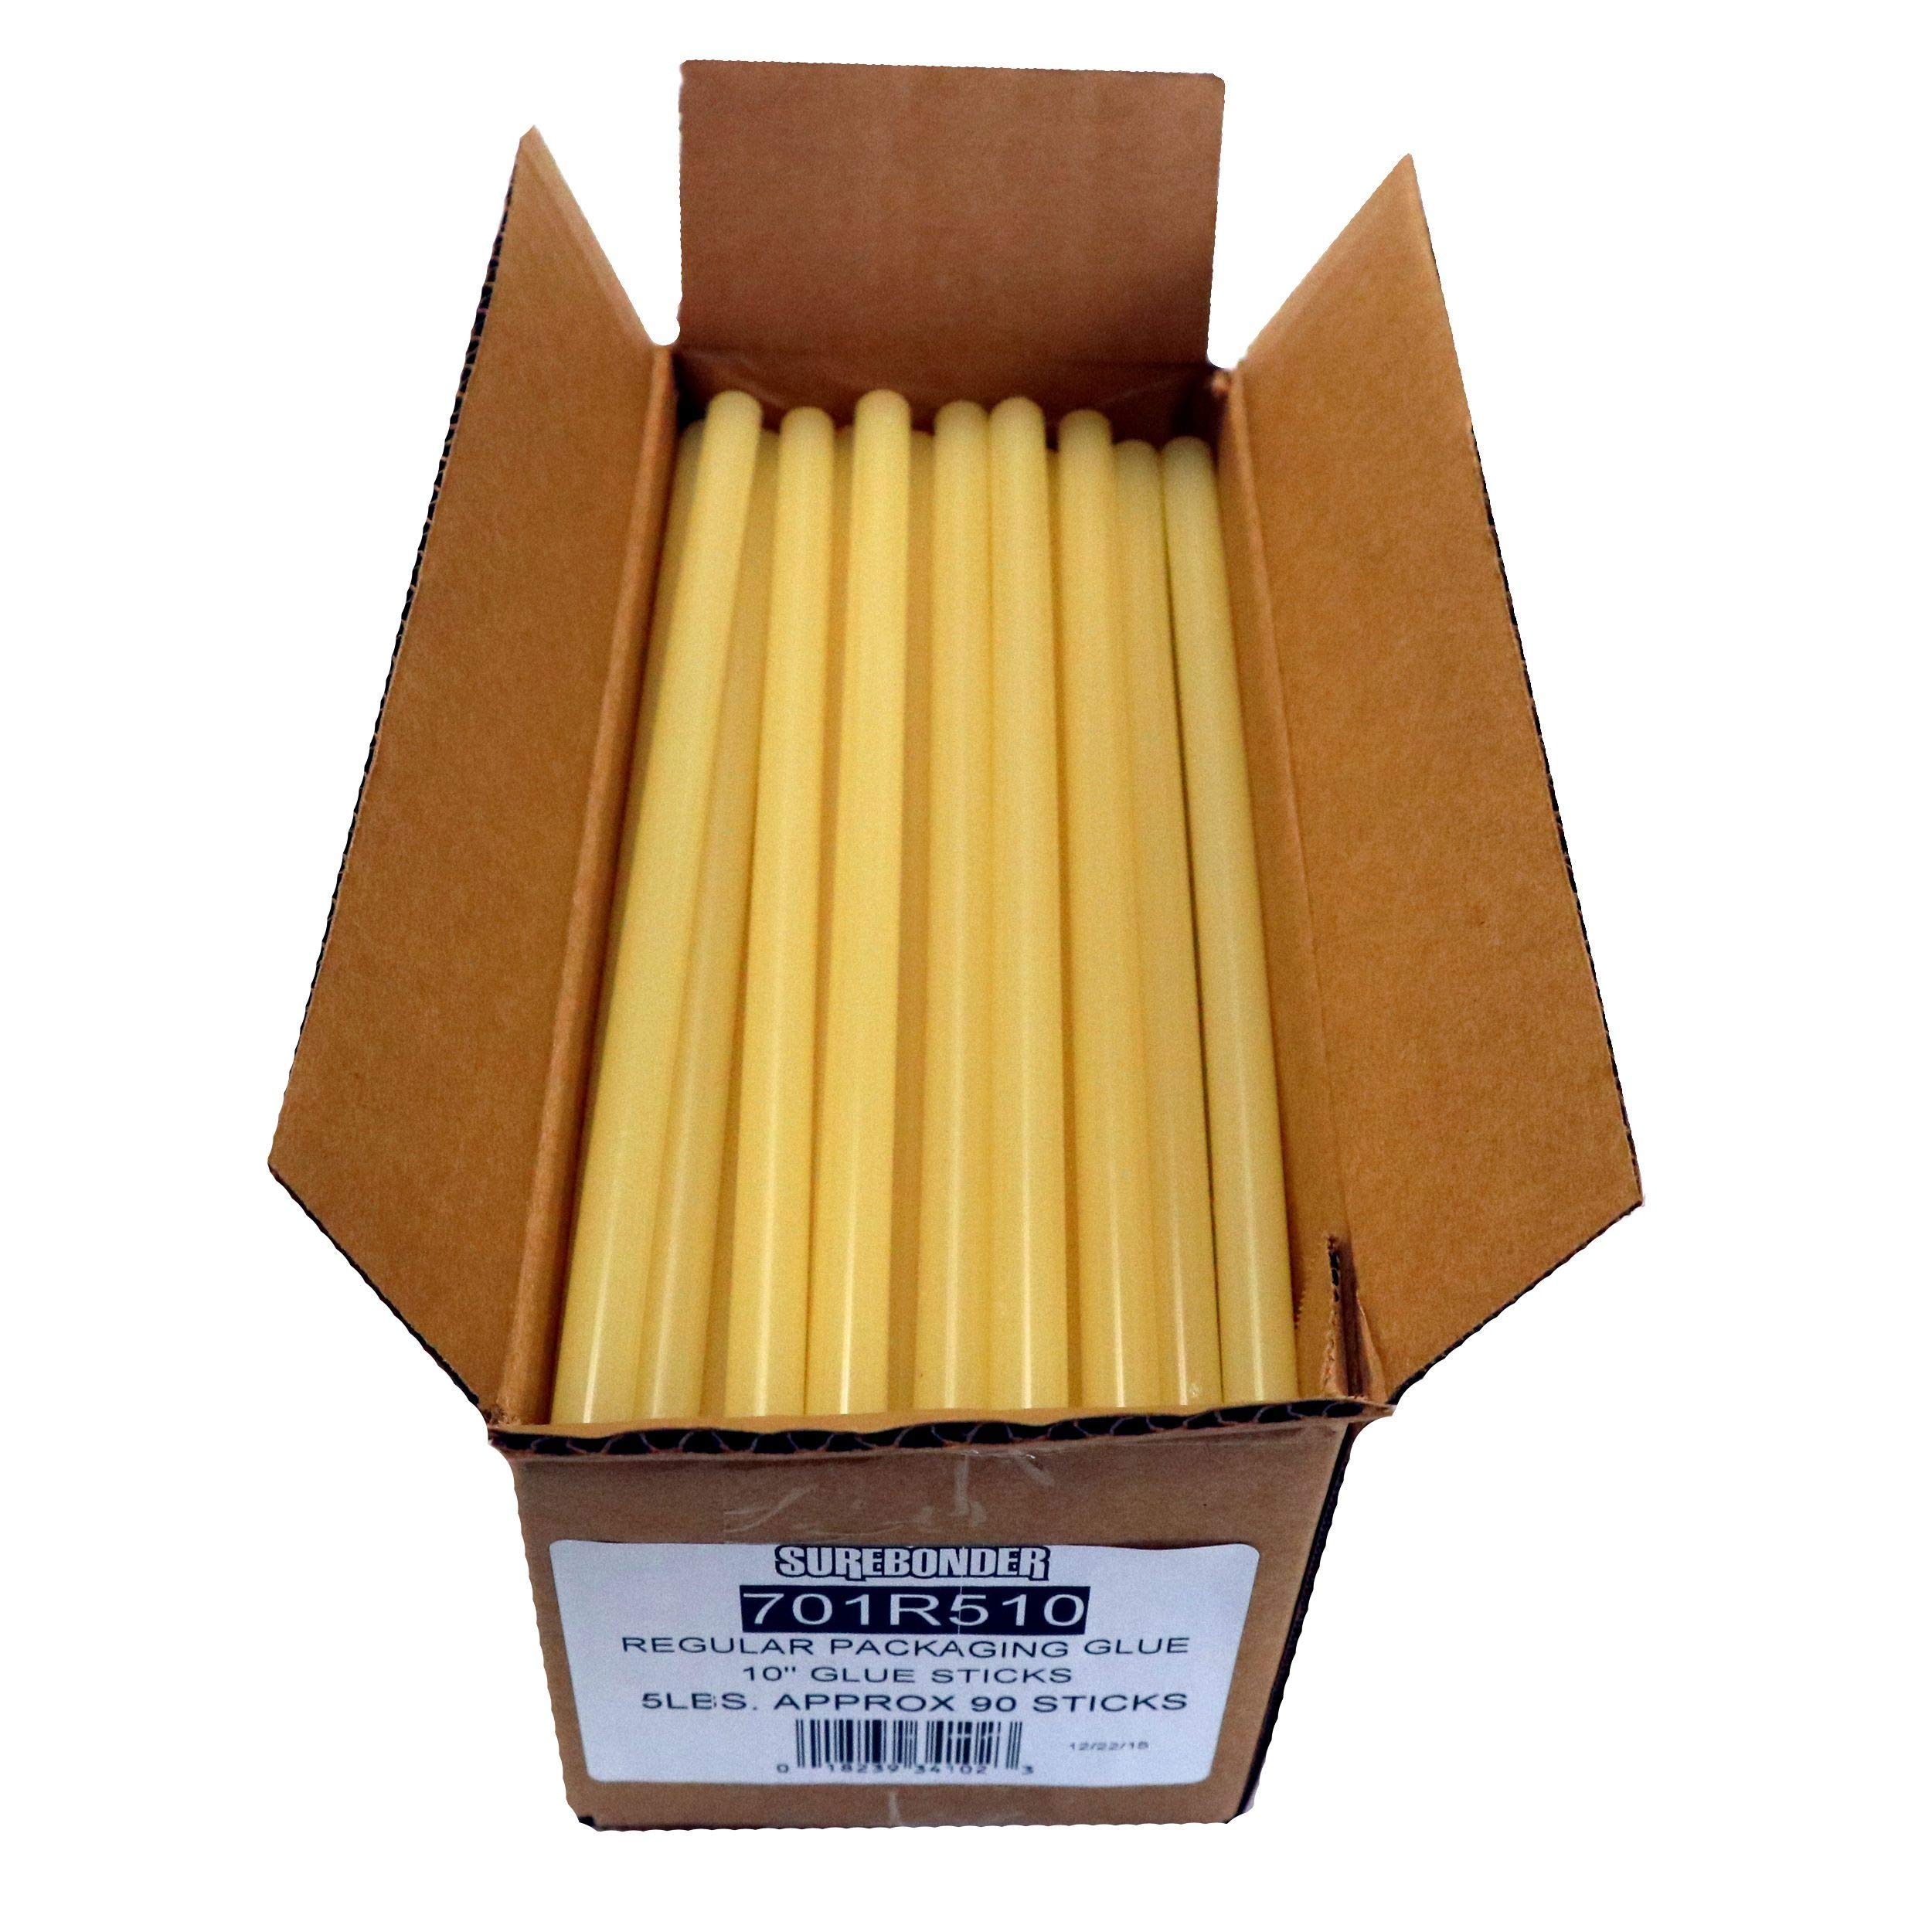 Surebonder 701R510  Fast Set Sealing Standard Glue Sticks, Made in the USA, 7/16'' x 10'' Length, 5 lb. Box, Light Amber, 90 Sticks (Pack of 90)